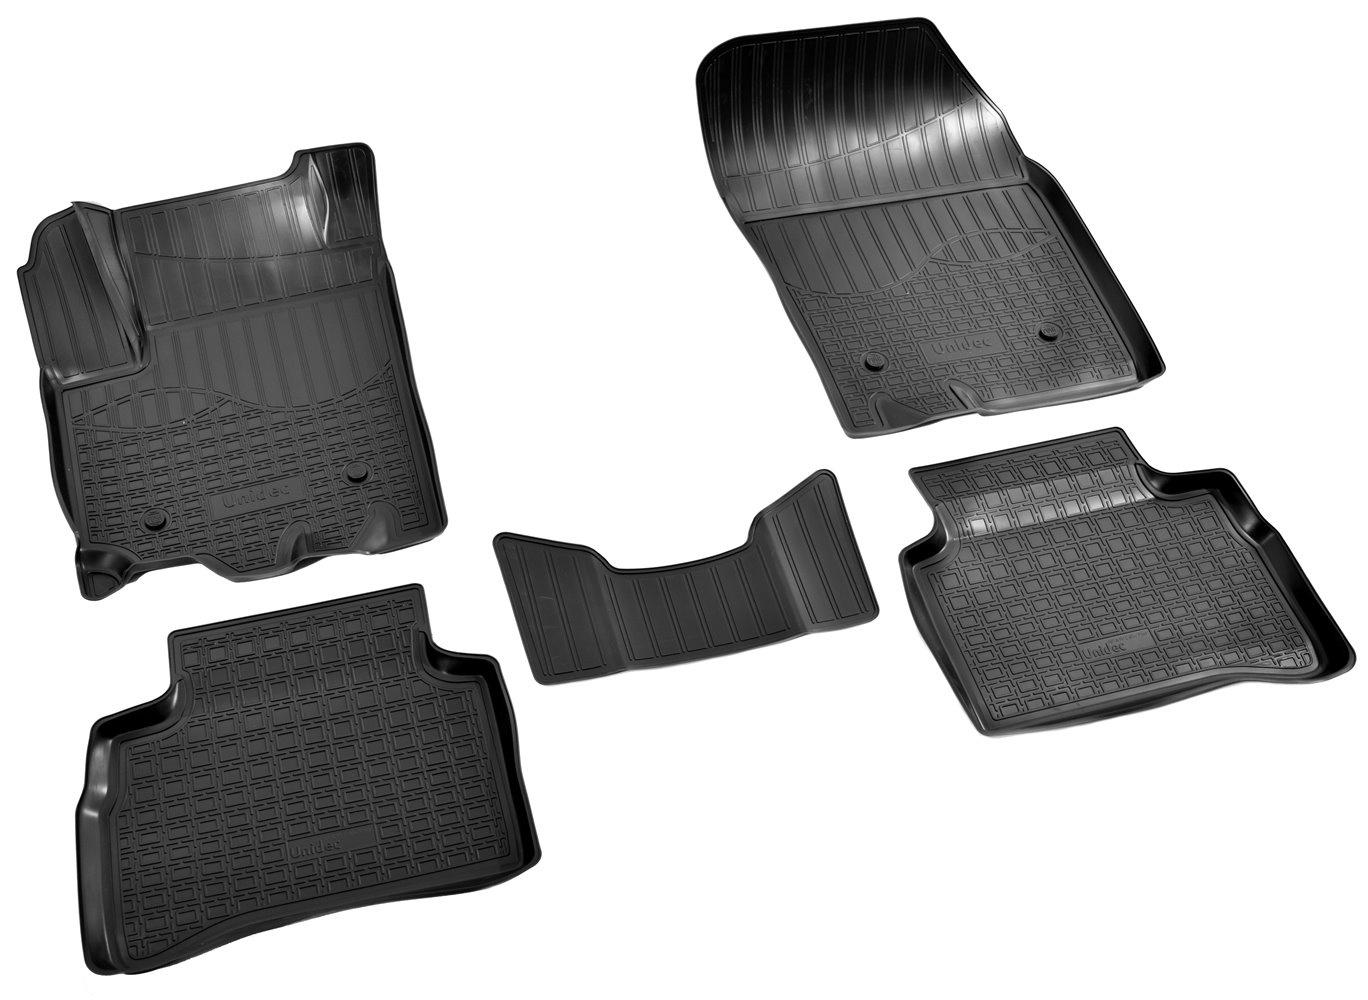 Коврики салона Norplast для Suzuki Vitara 3D 2015, NPA11-C85-750, черный коврик на торпеду для телефона для suzuki new vitara 2015